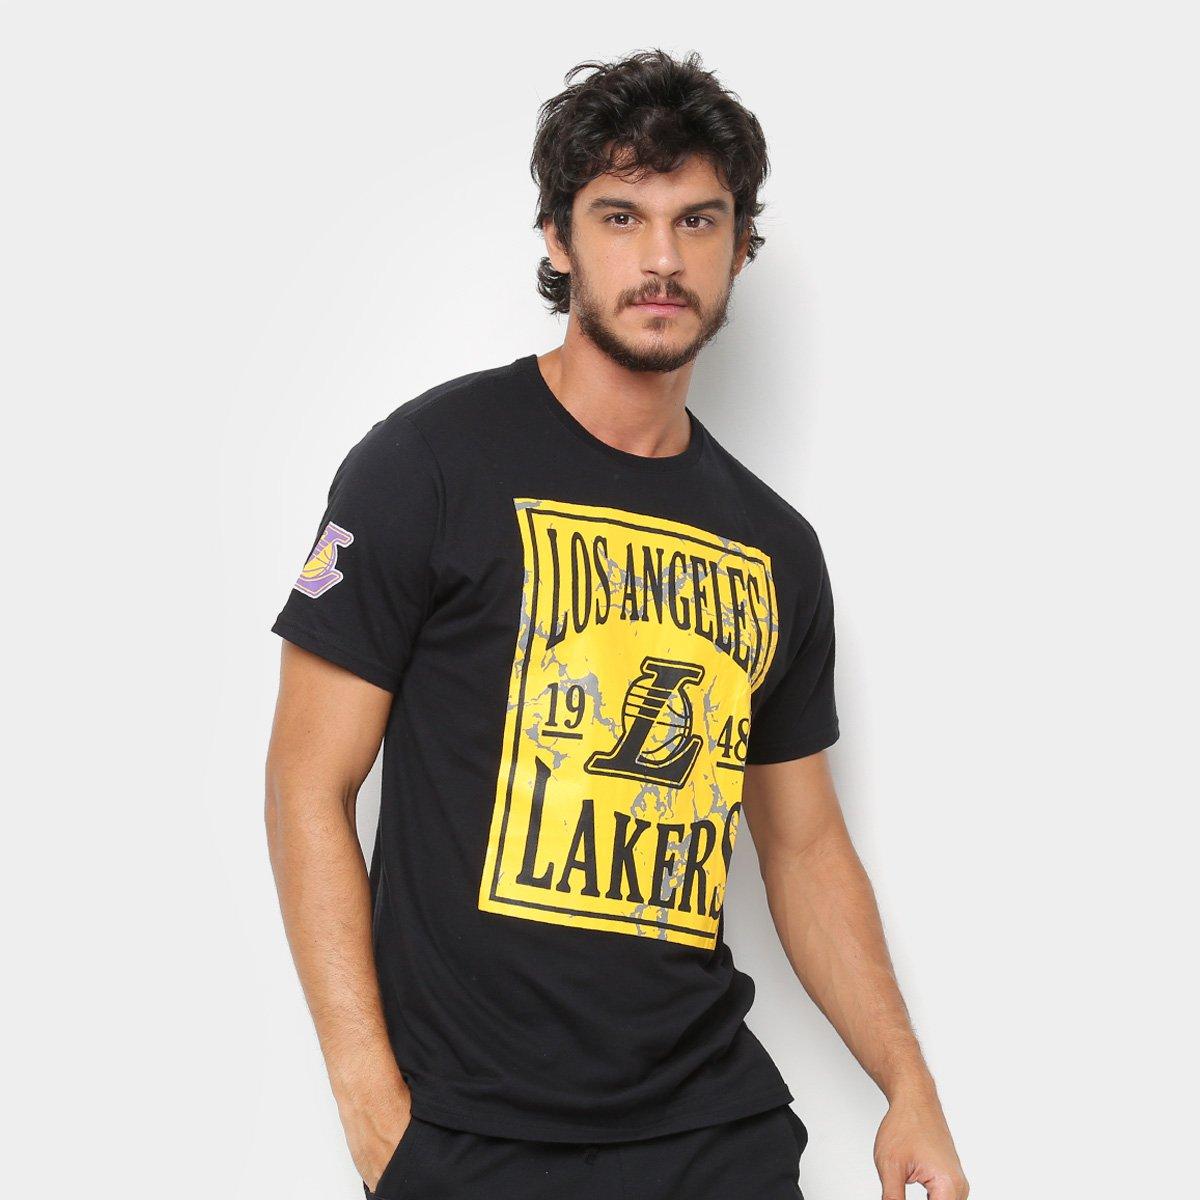 ec6e213f1 Camiseta NBA Los Angeles Lakers Ticket Masculina - Preto - Compre Agora